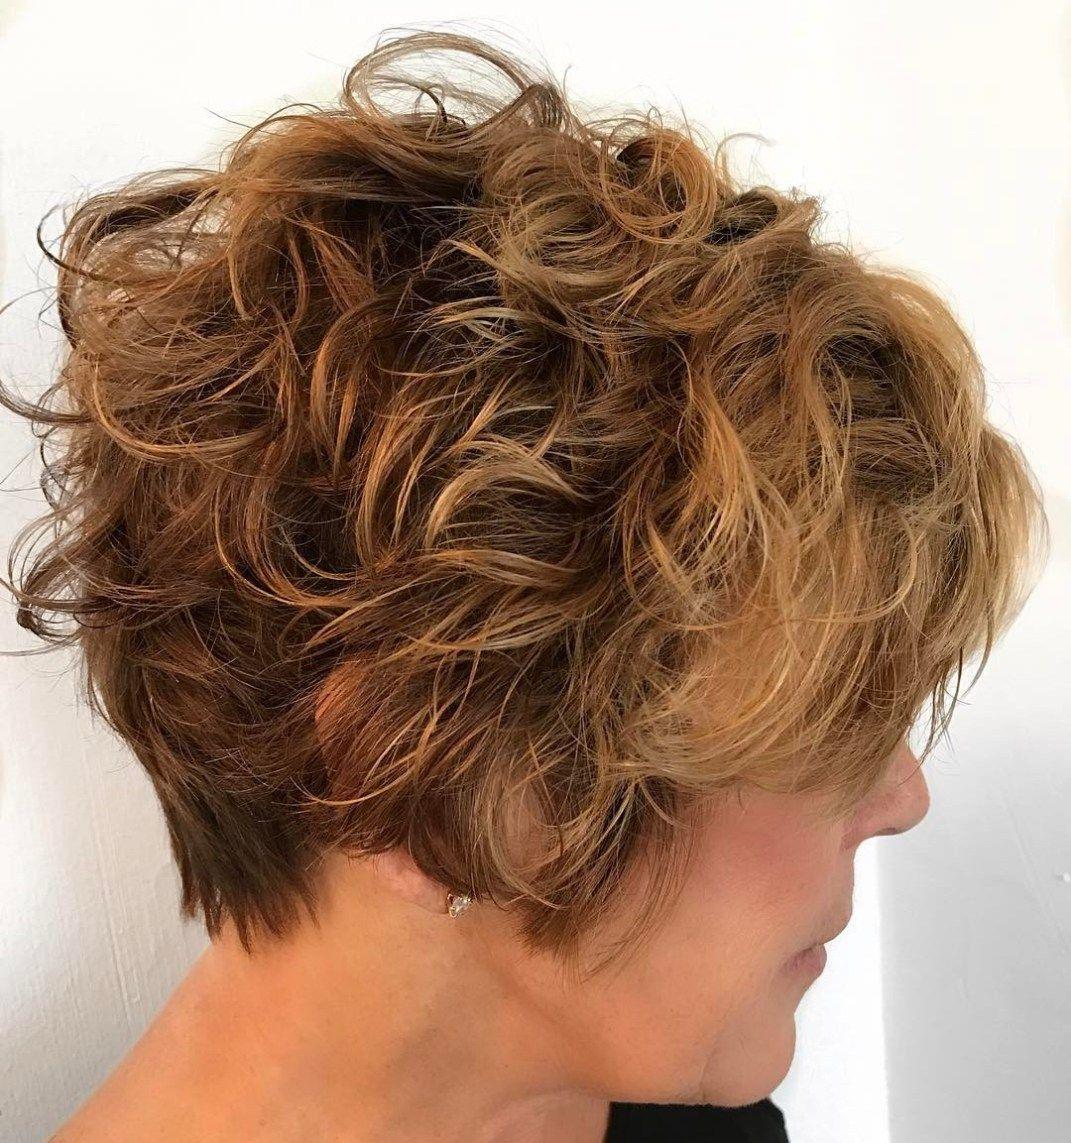 50 short curly hairstyle short curly hairstyles for